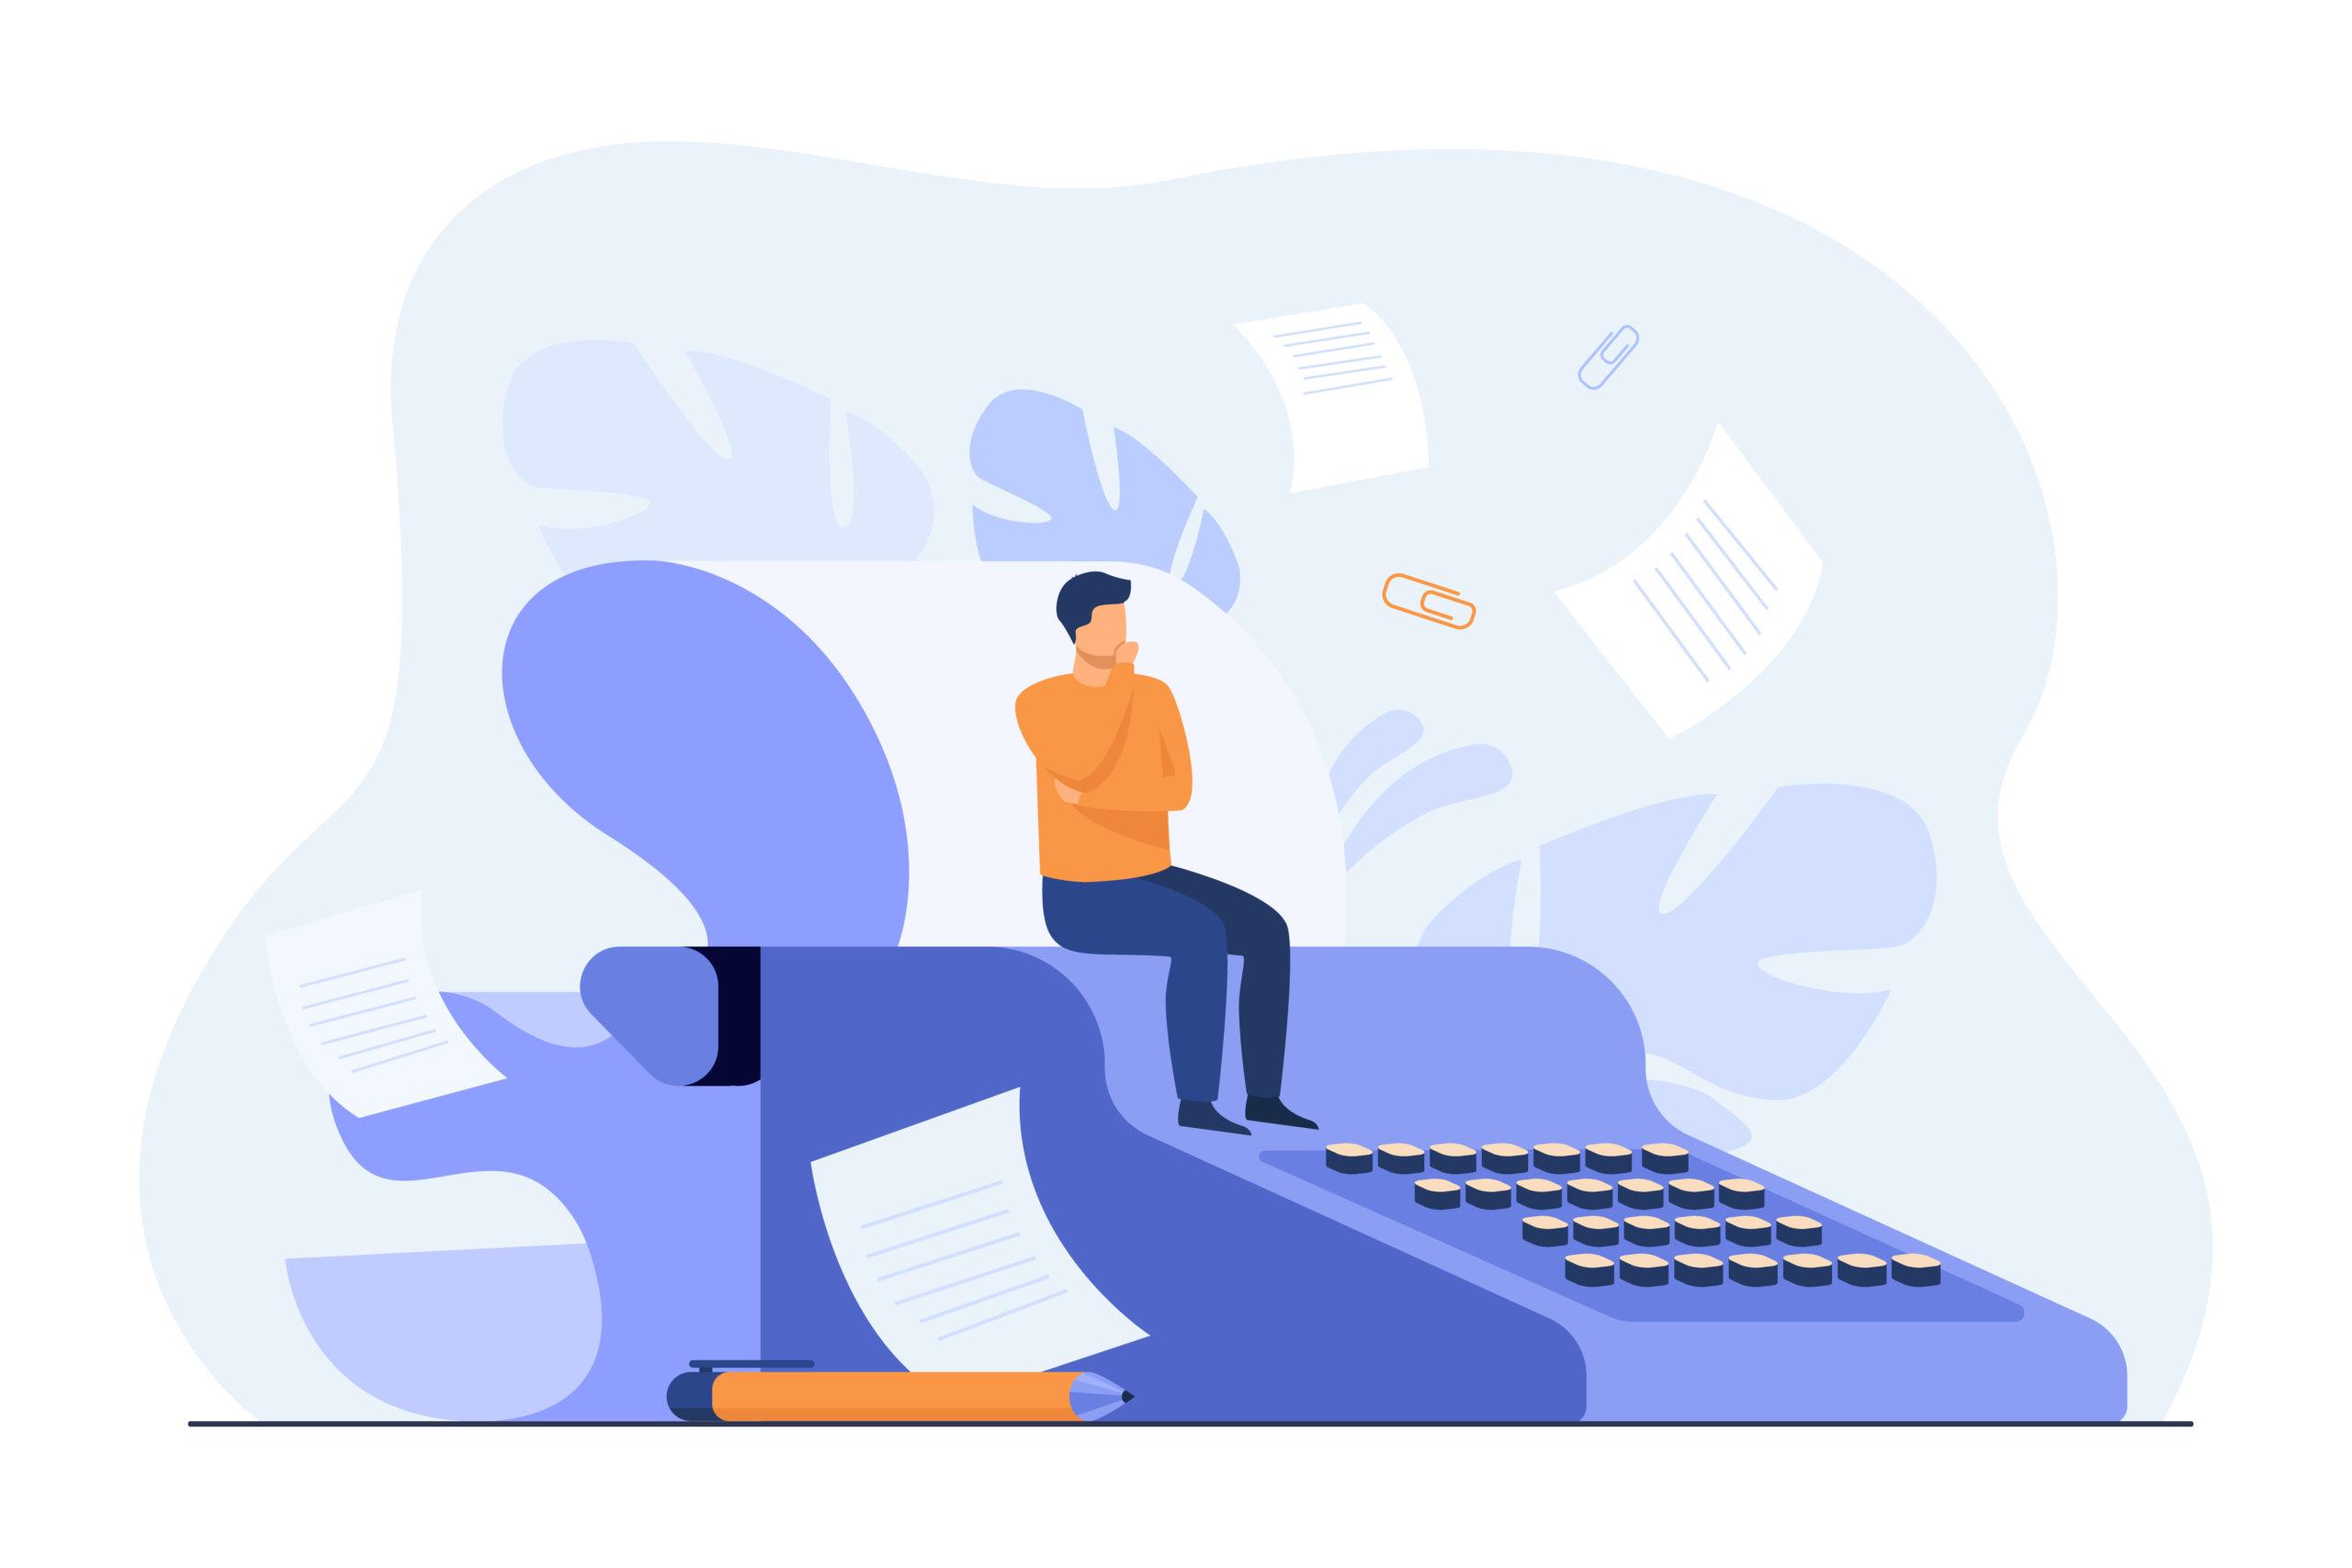 Como o Script de Vendas Vai Transformar a Sua Empresa